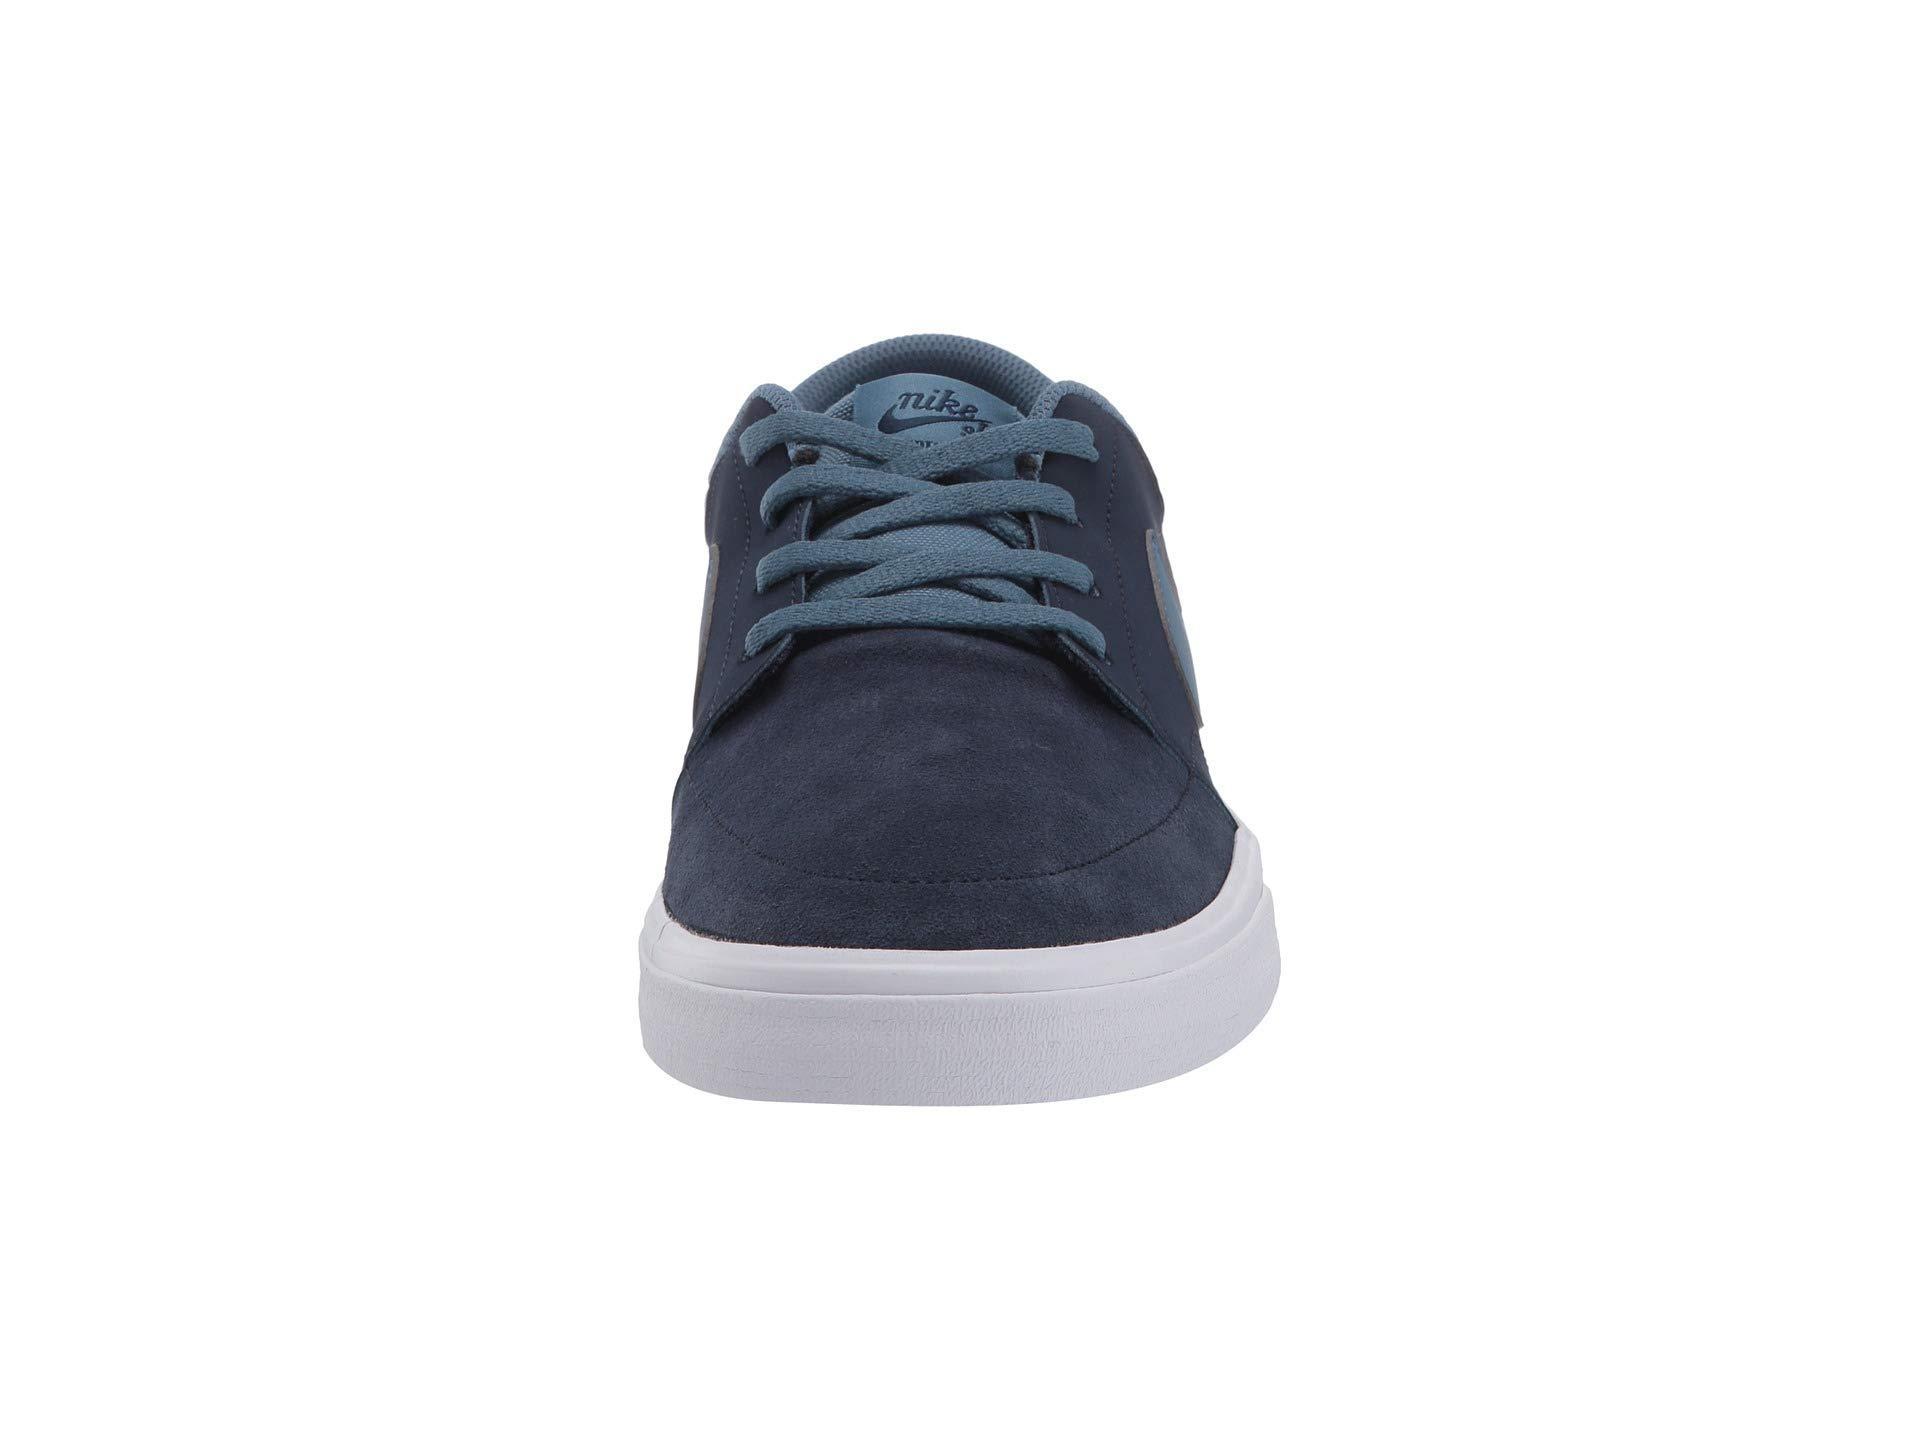 b03c03e67fa Nike - Portmore Ii Solar - Suede (gunsmoke black white white). View  fullscreen